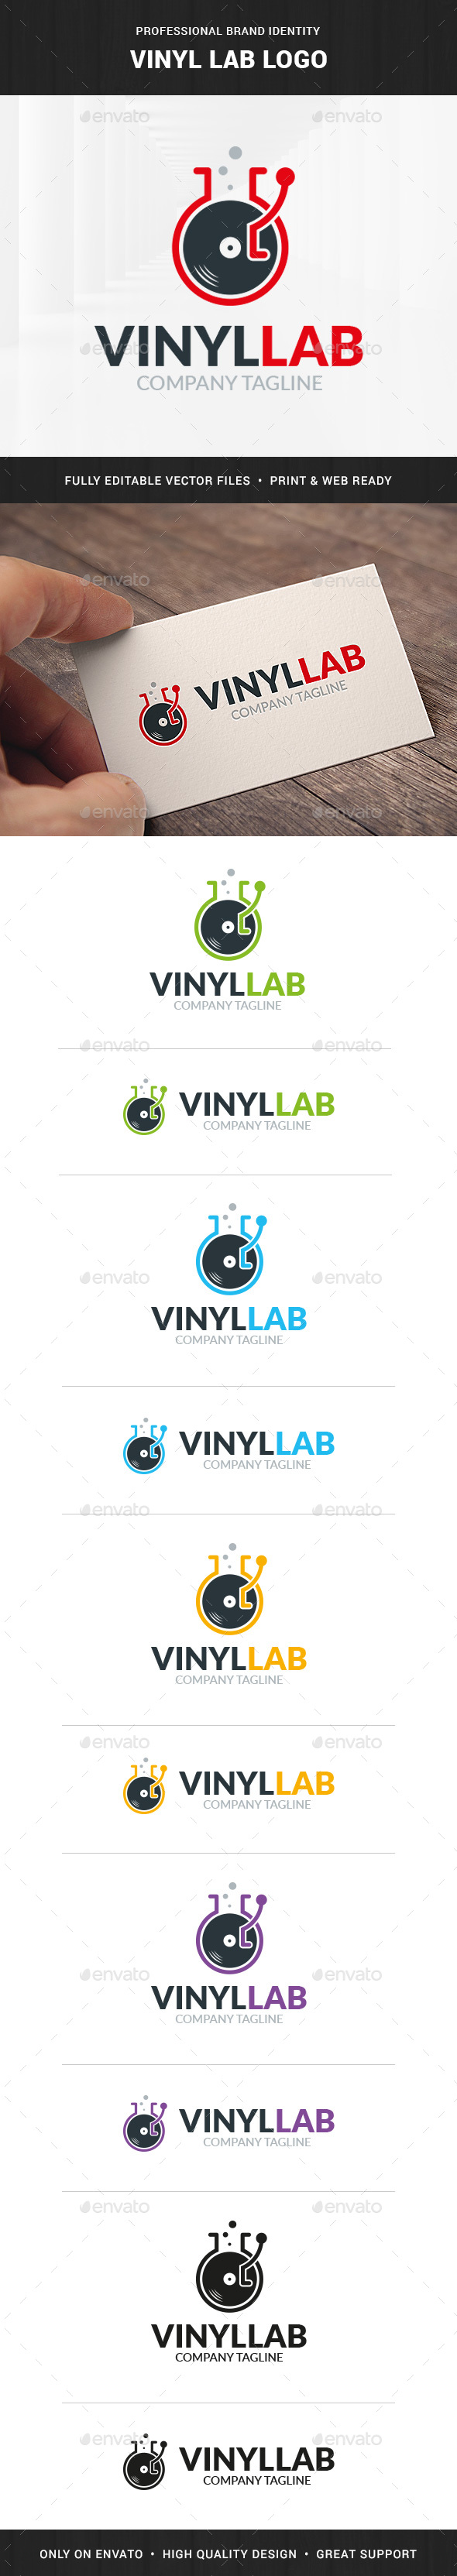 Vinyl Lab Logo Template